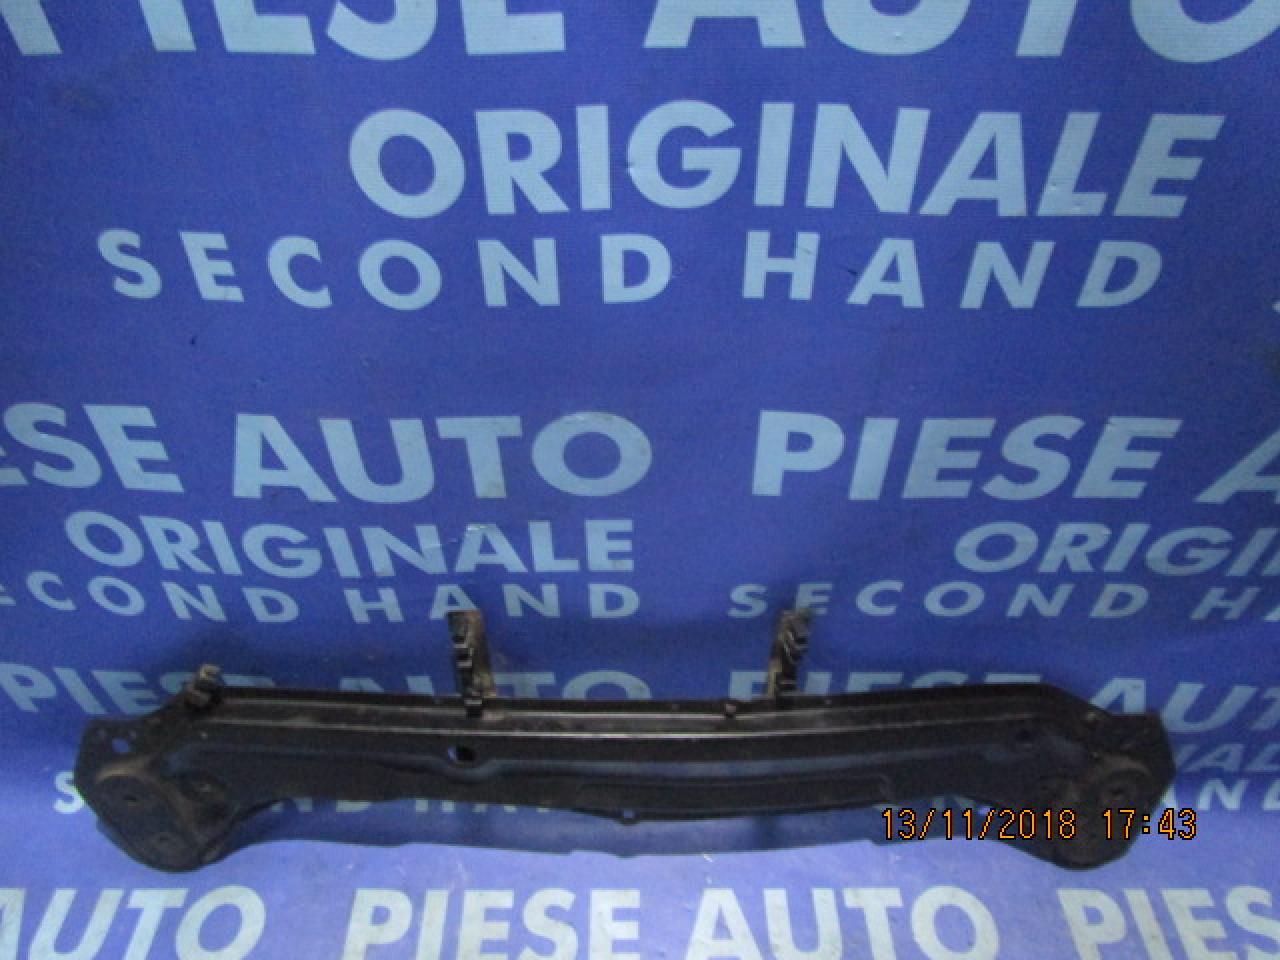 Cadru motor mic (persou mic) Peugeot 807 2.0hdi (suport radiatoare)